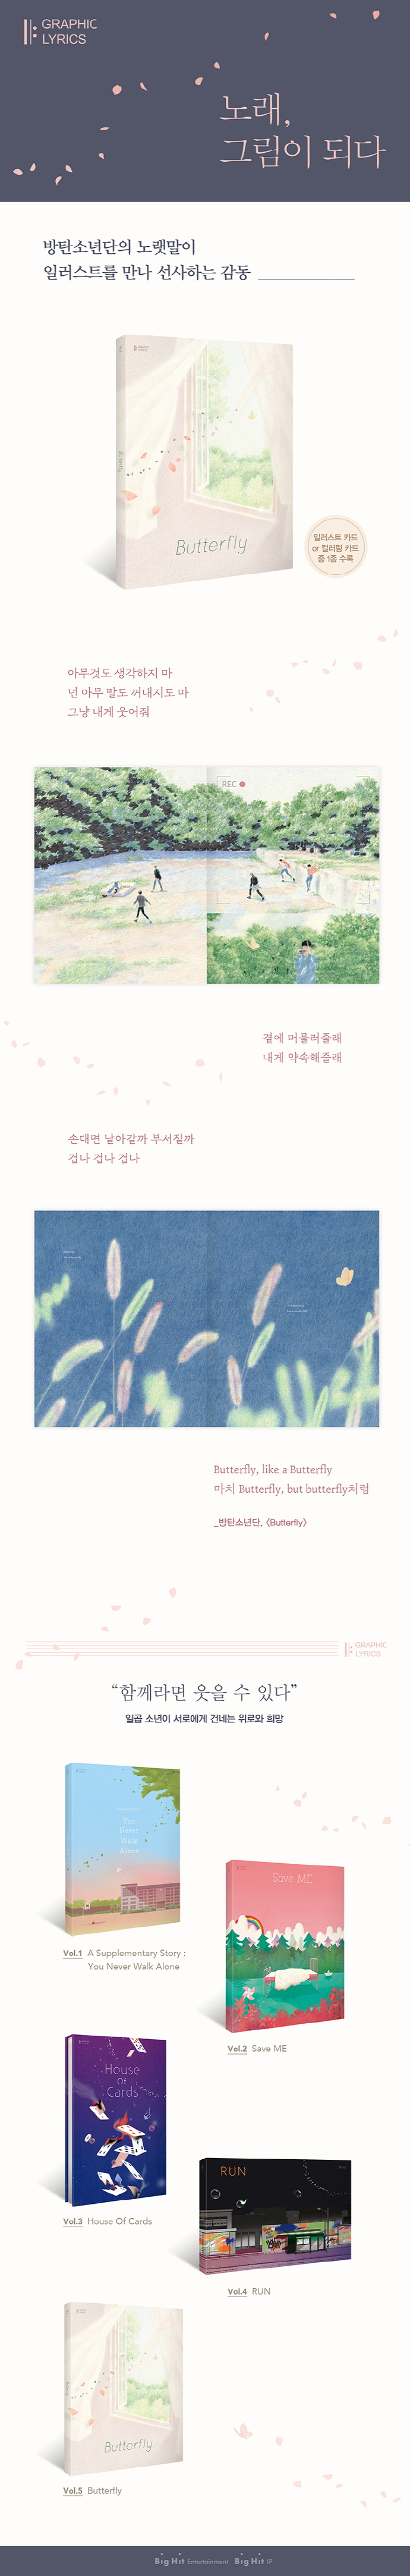 Butterfly(양장본 HardCover) 도서 상세이미지